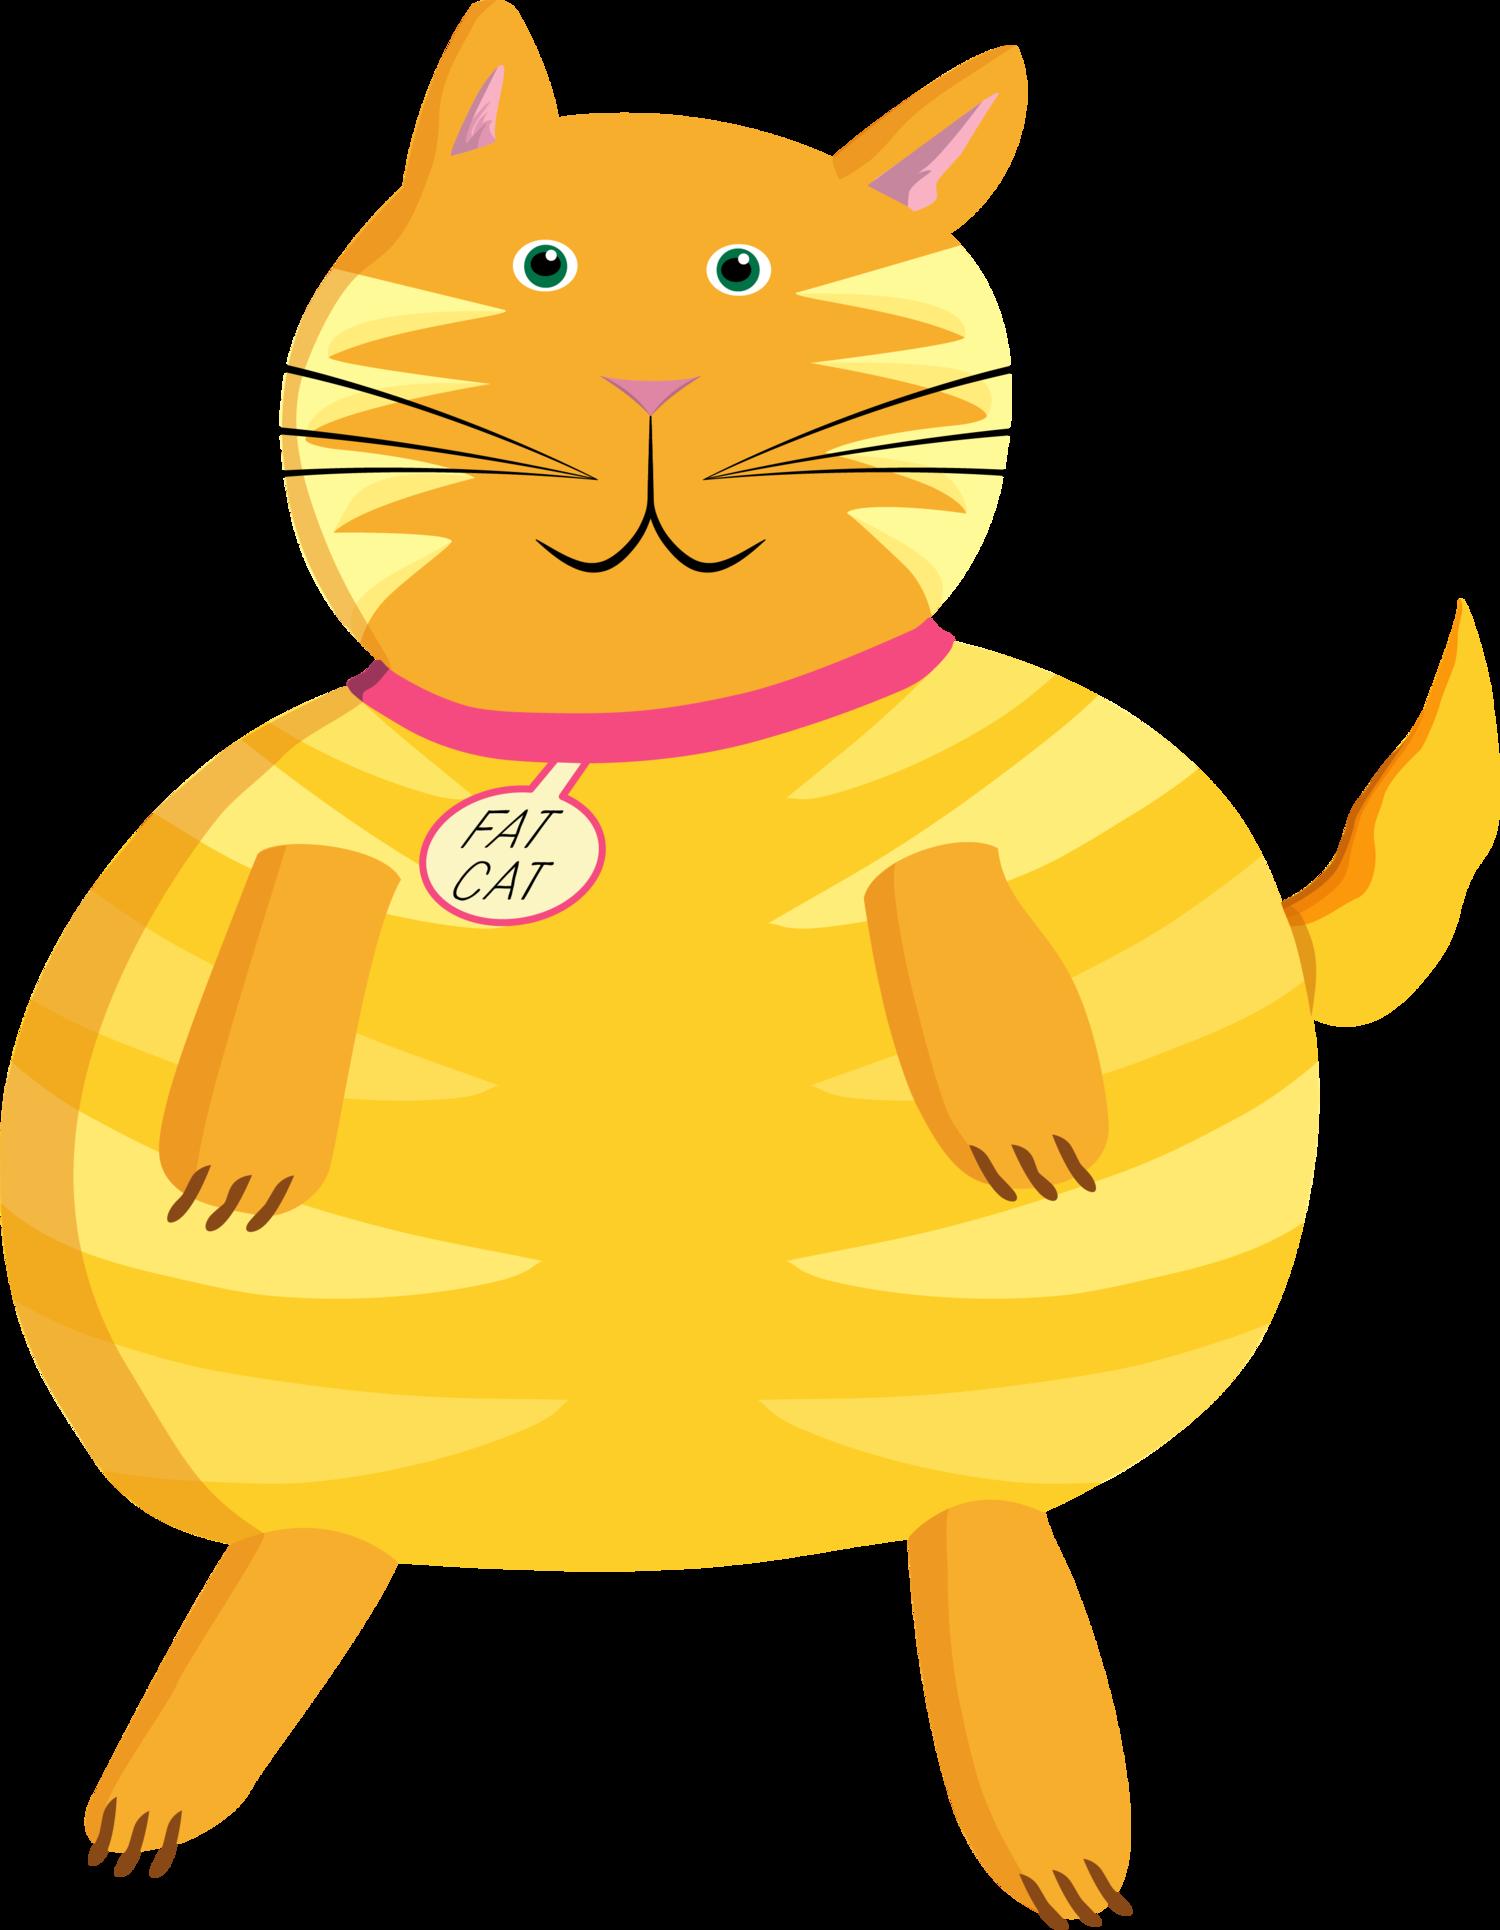 vector download Fat cat productions . Goal clipart production